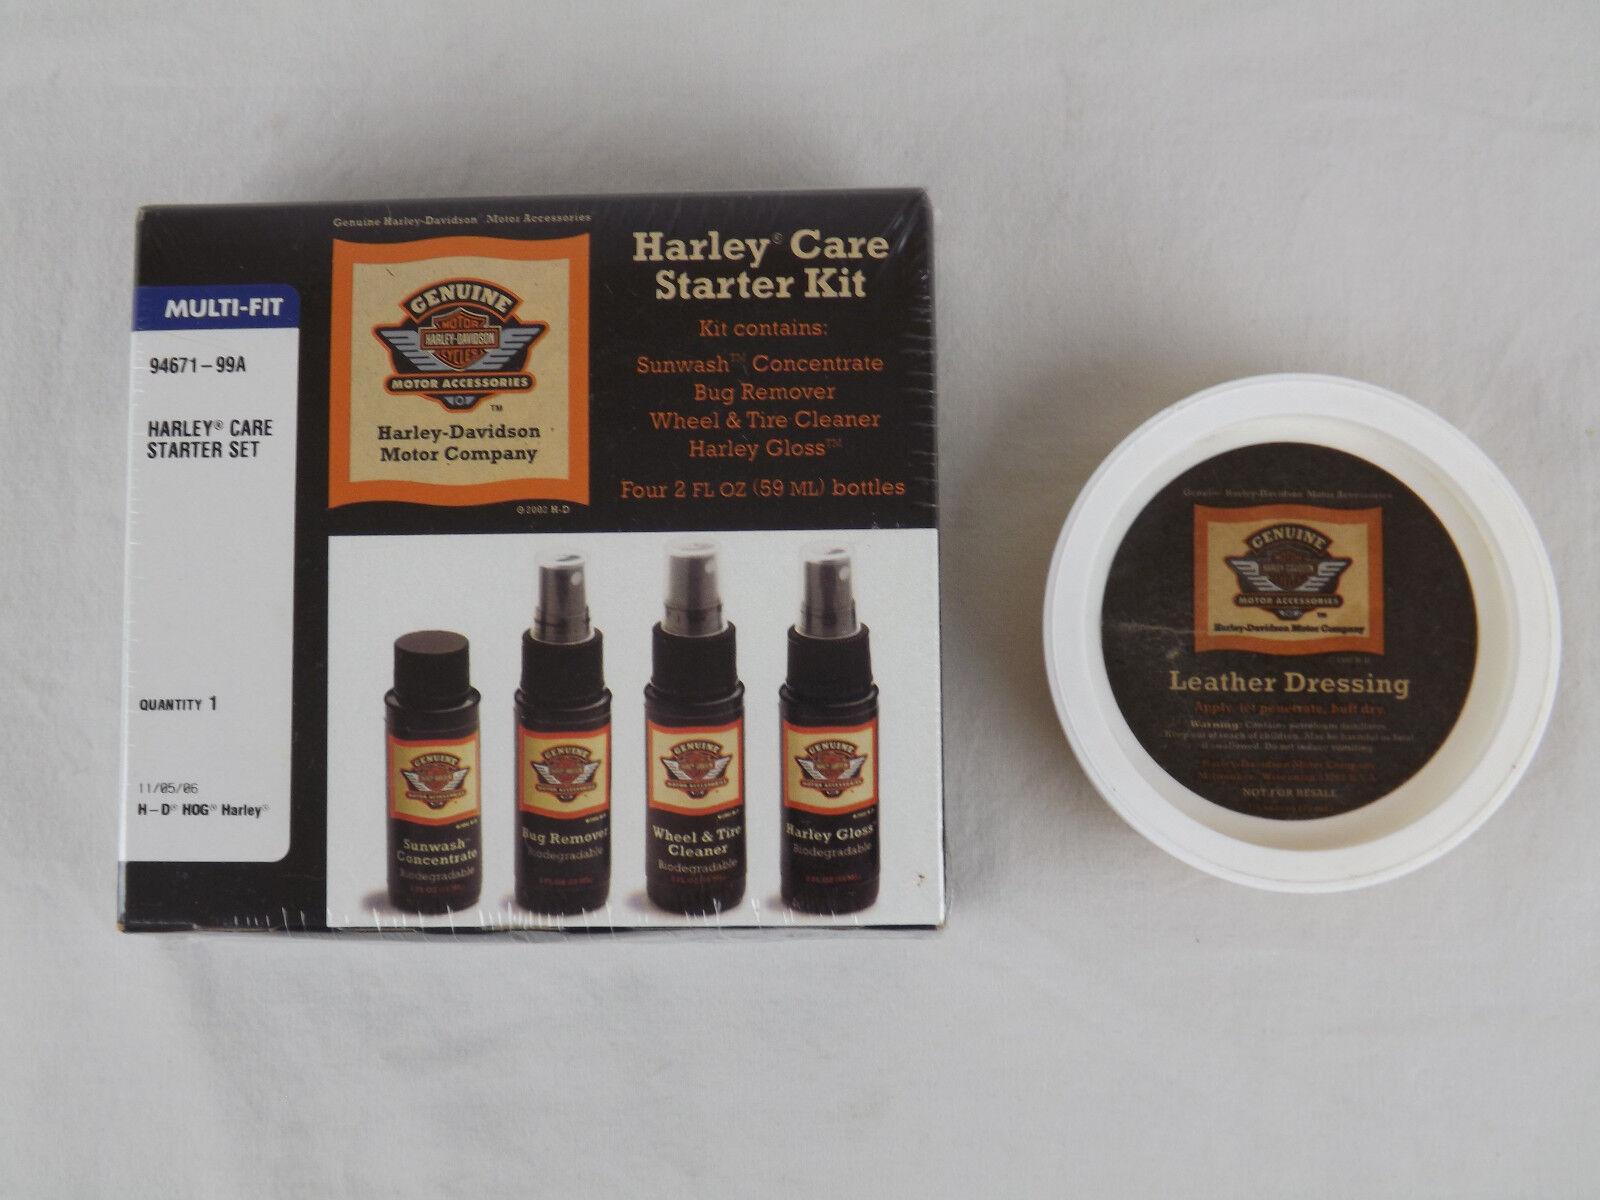 Harley davidson care starter kit 94671 99a leather for Kia motors daphne alabama